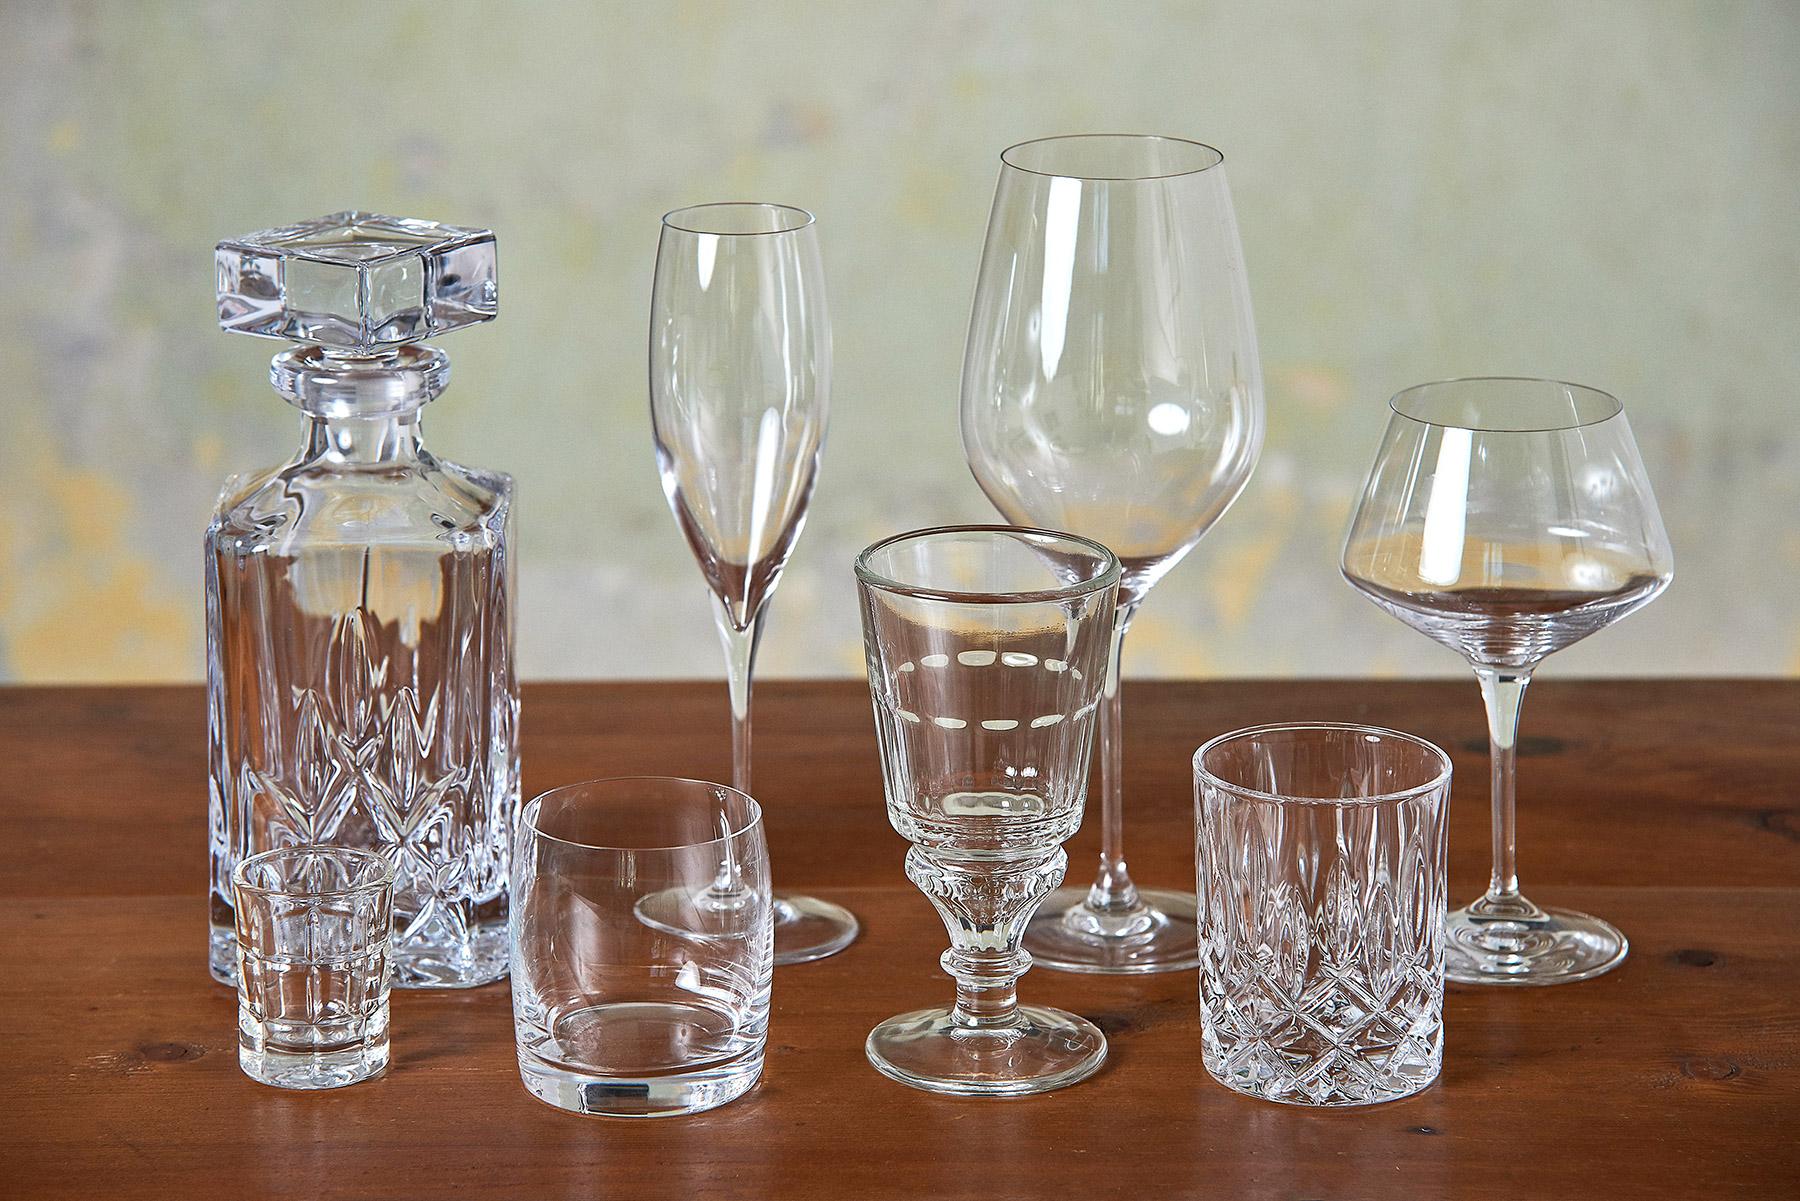 Různé druhy skleniček na alkohol a karafa